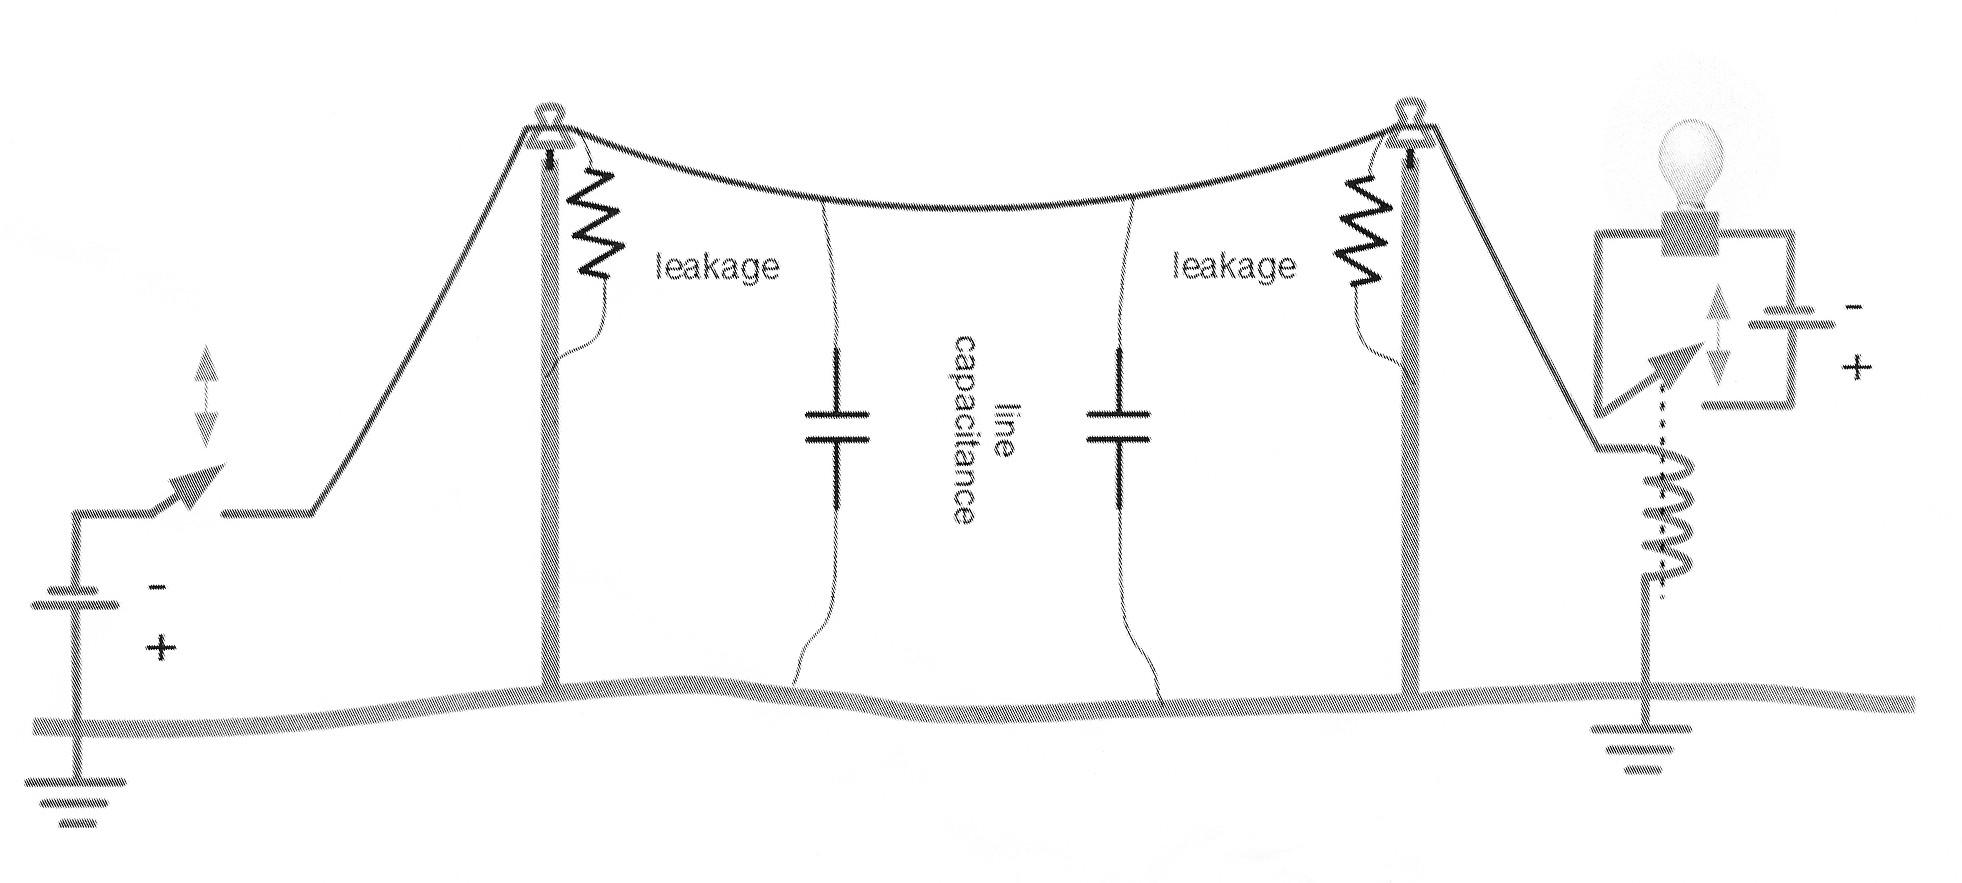 Insulator Line telegraph